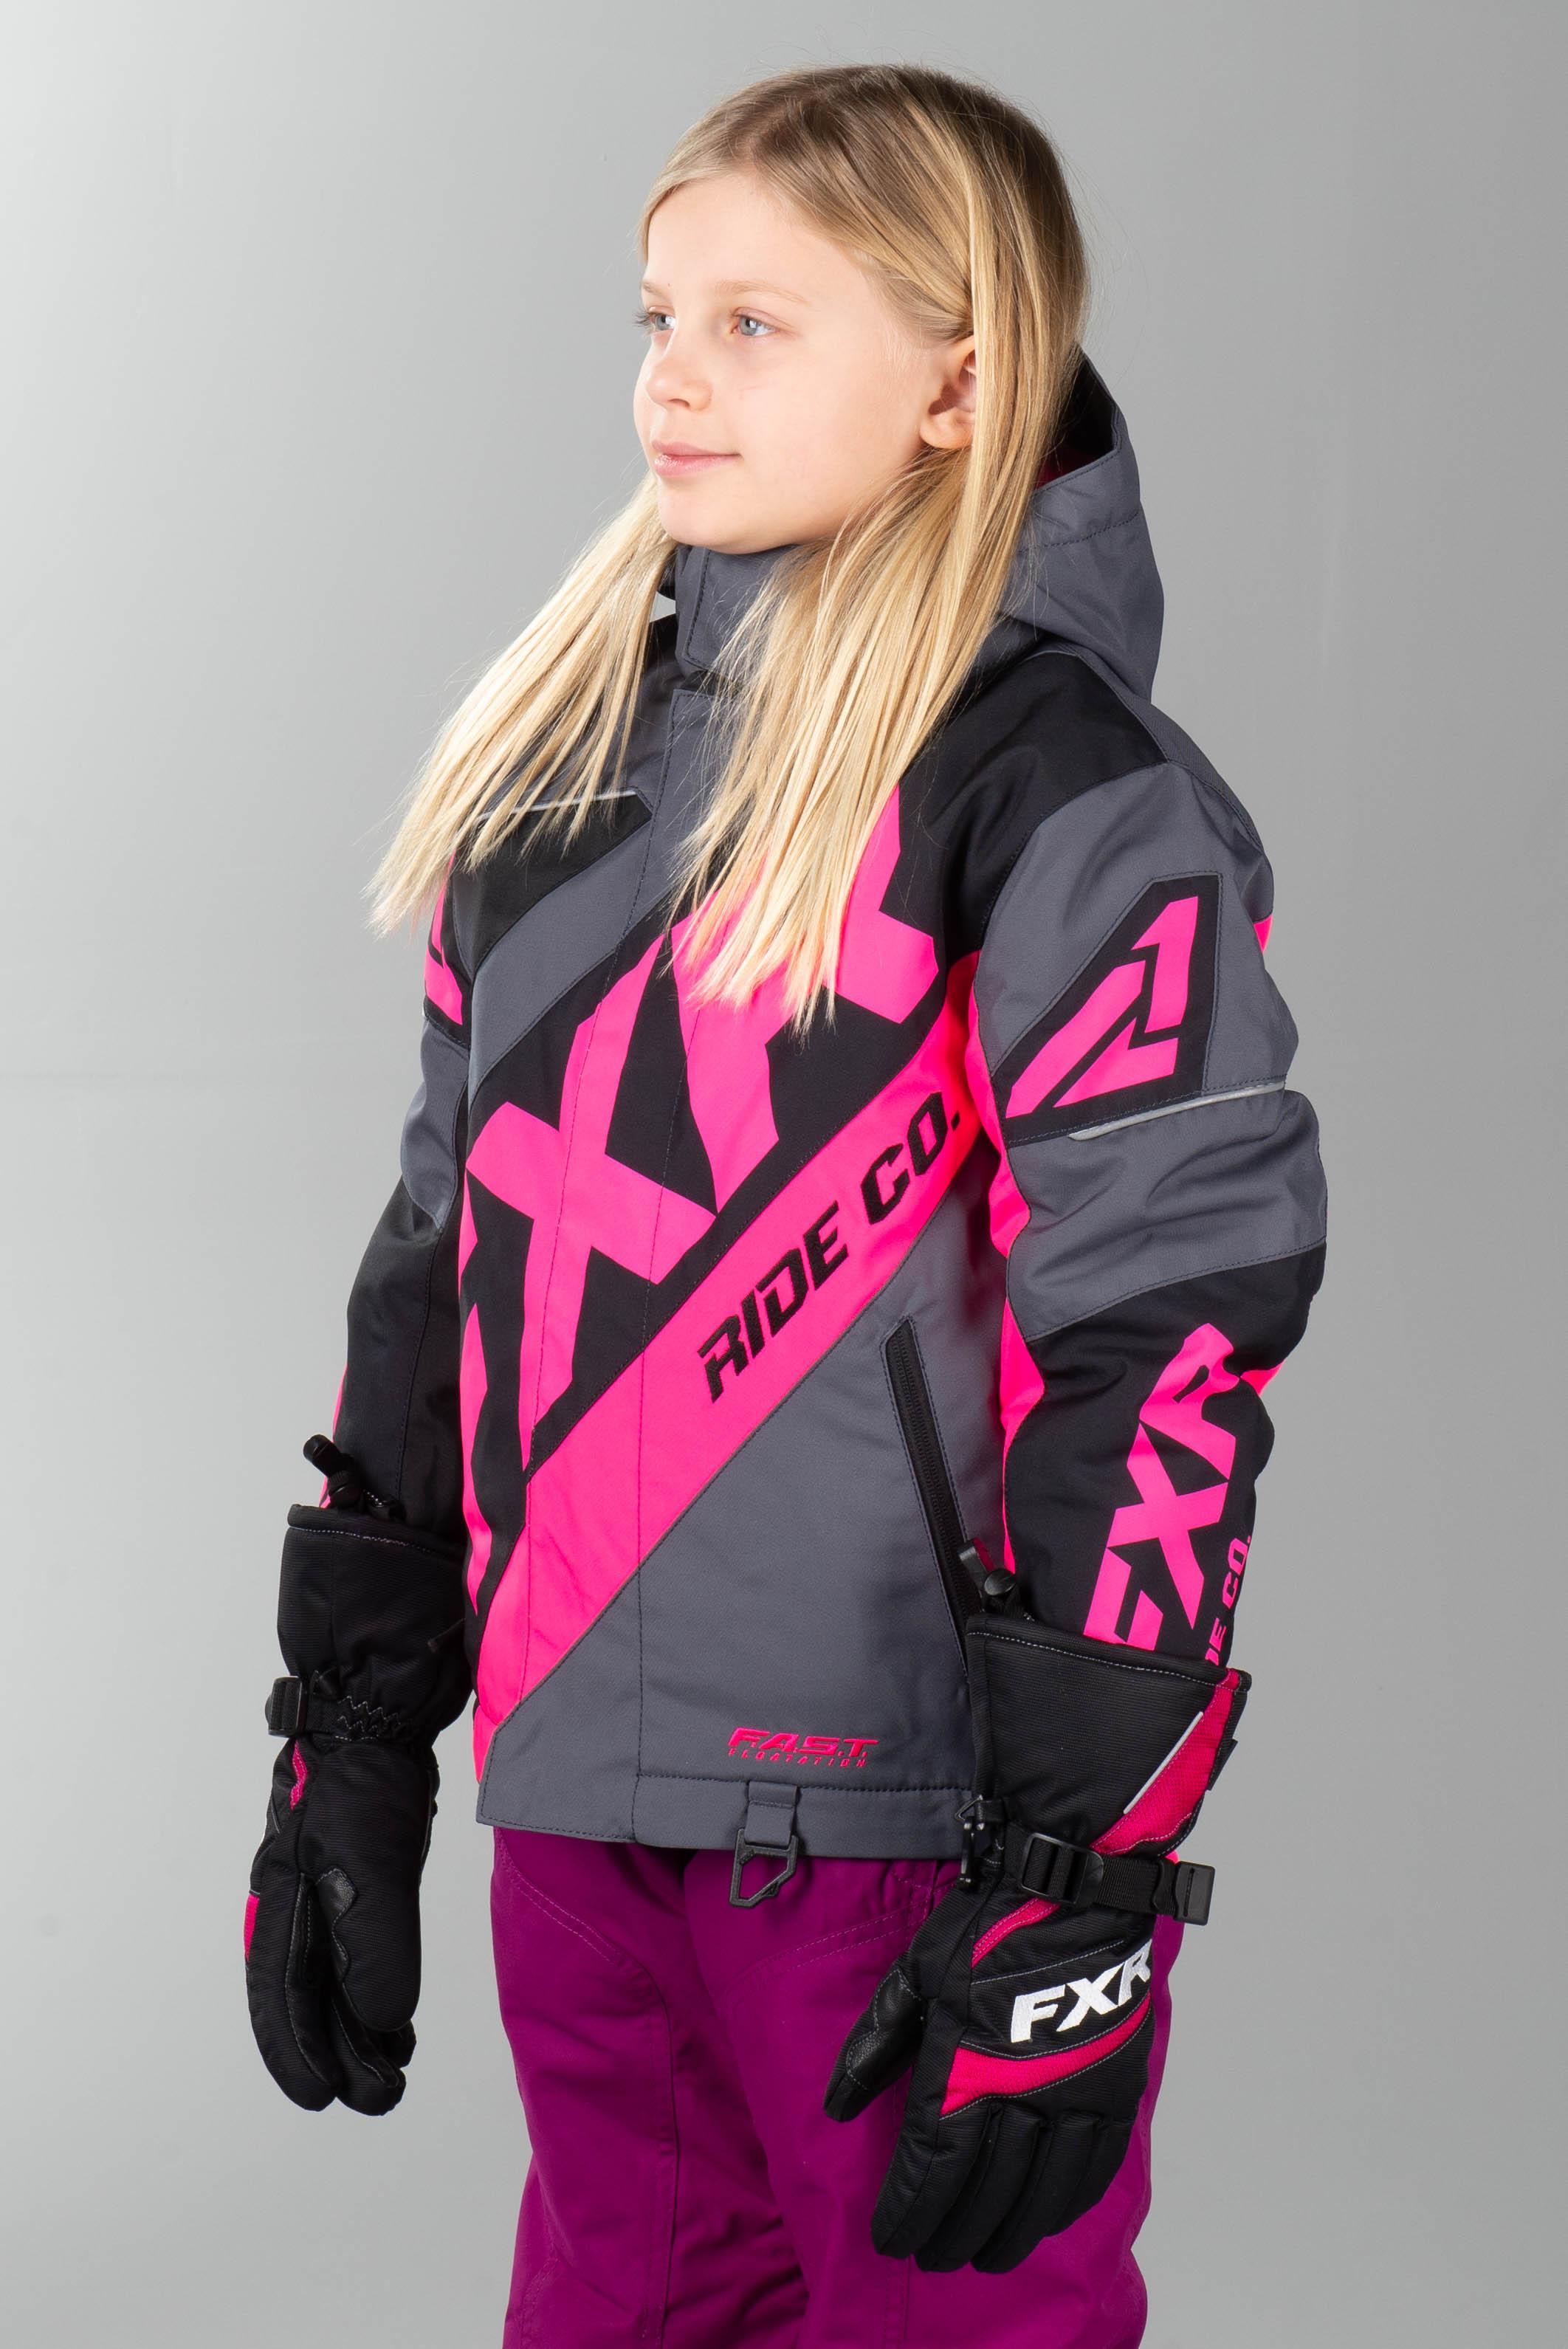 Jakke FXR CX Junior Black Ops